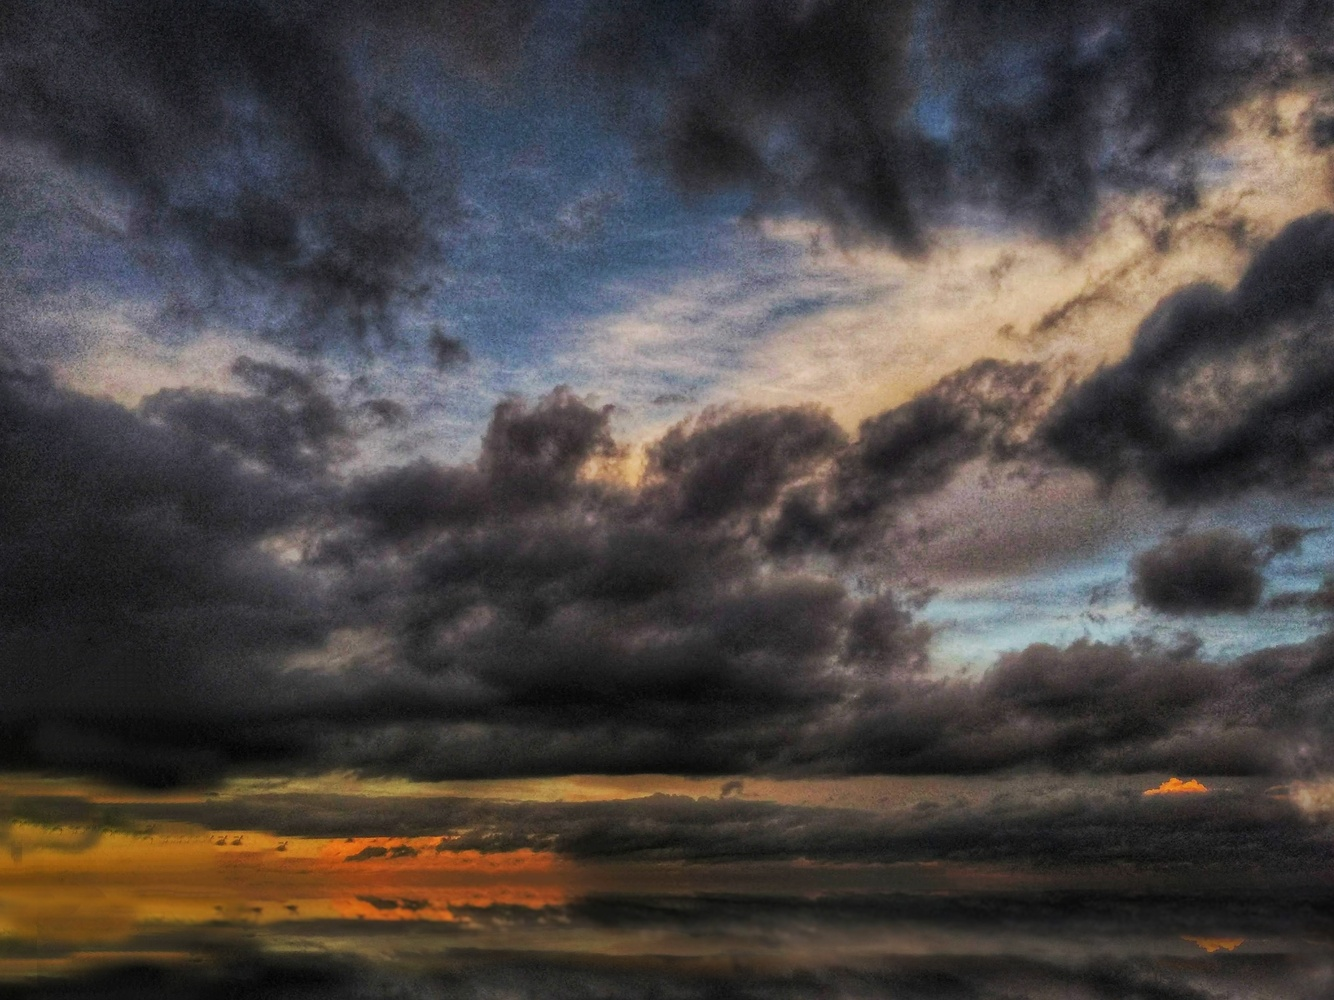 Stormy Sky at Sea by Jack Sprog